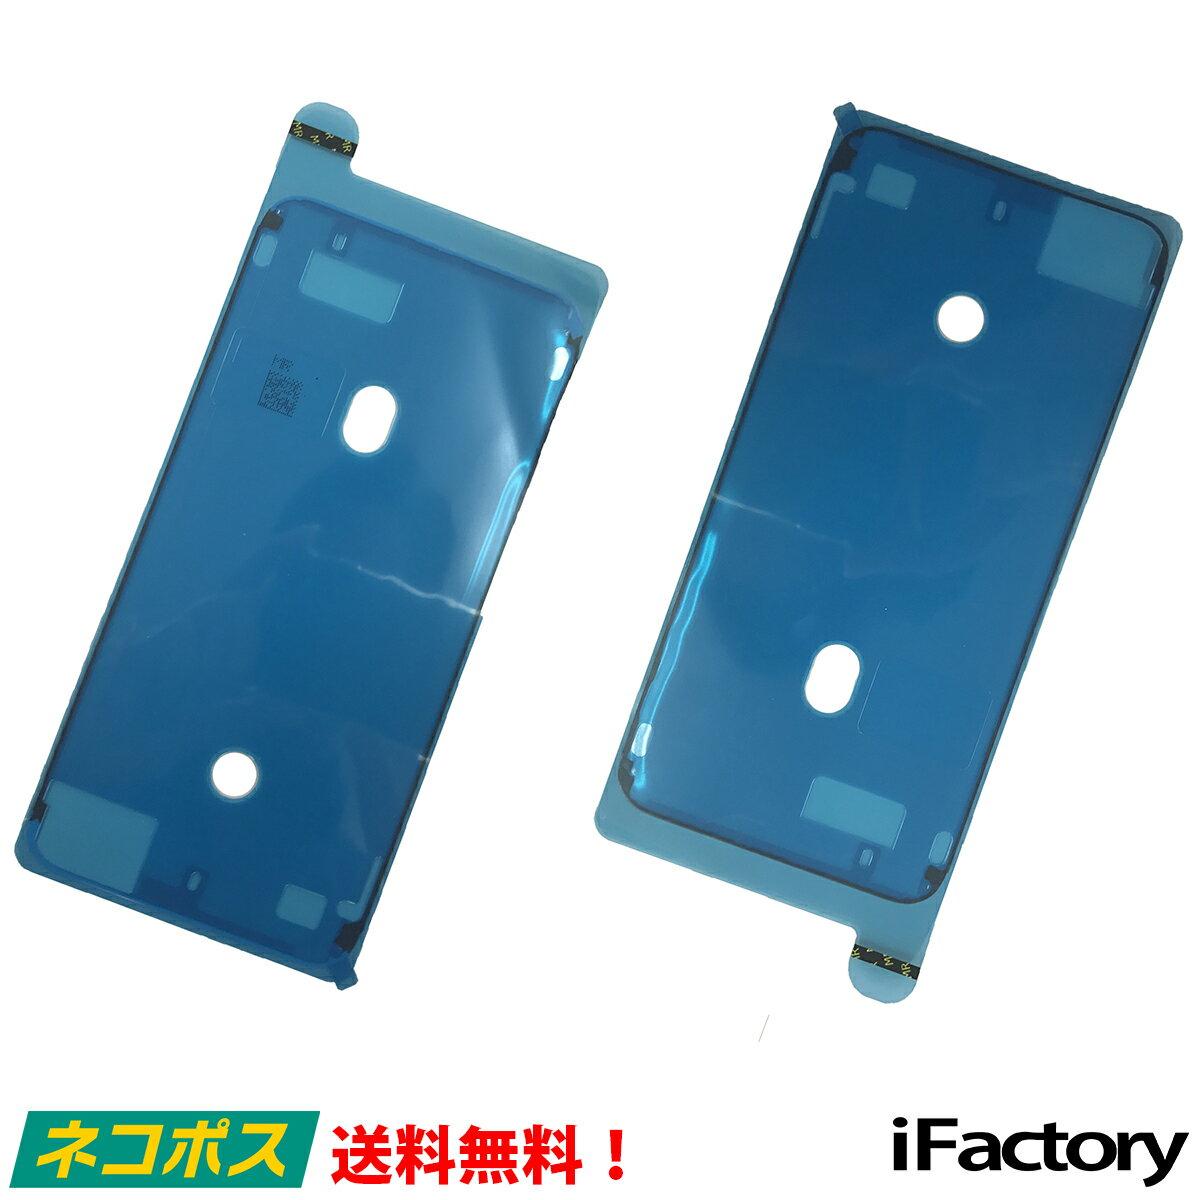 iPhone6s/7/6sPlus/7Plus フロントパネル固定用シーラントグルー バッテリー交換時に! 修理 交換用リペアパーツ